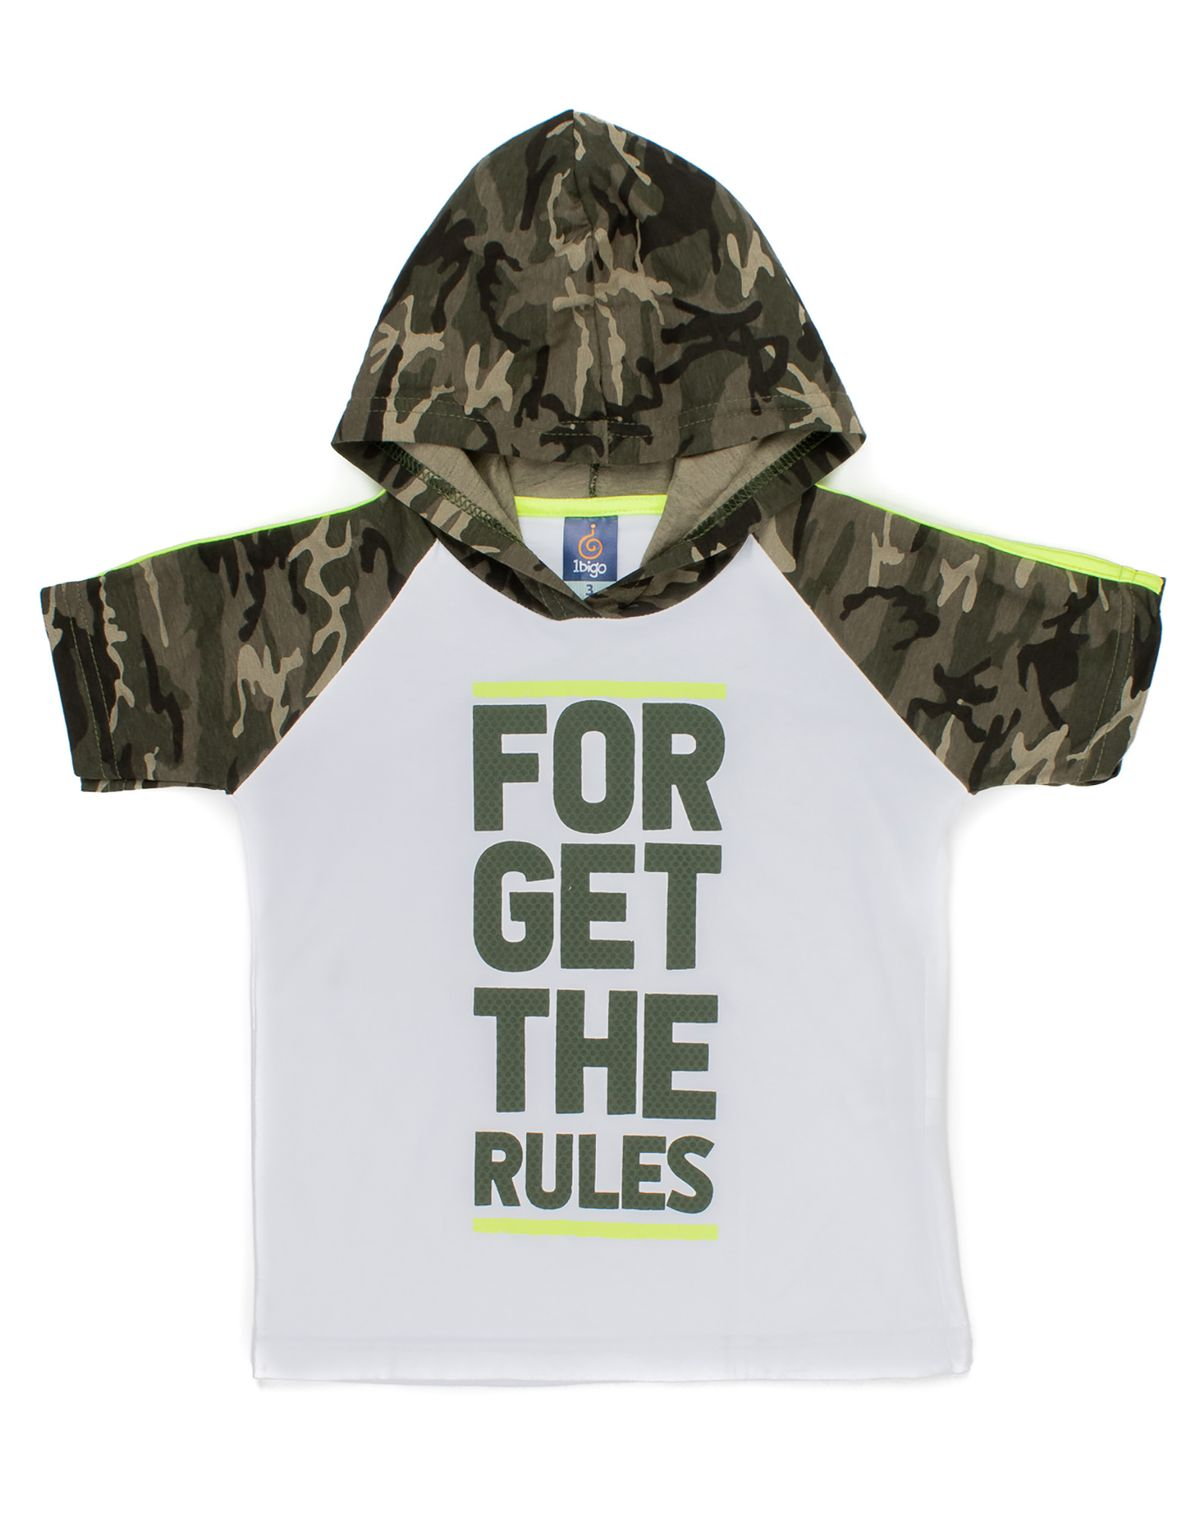 559466001-camiseta-manga-curta-bebe-menino-recorte-camuflado-capuz-branco-1-201